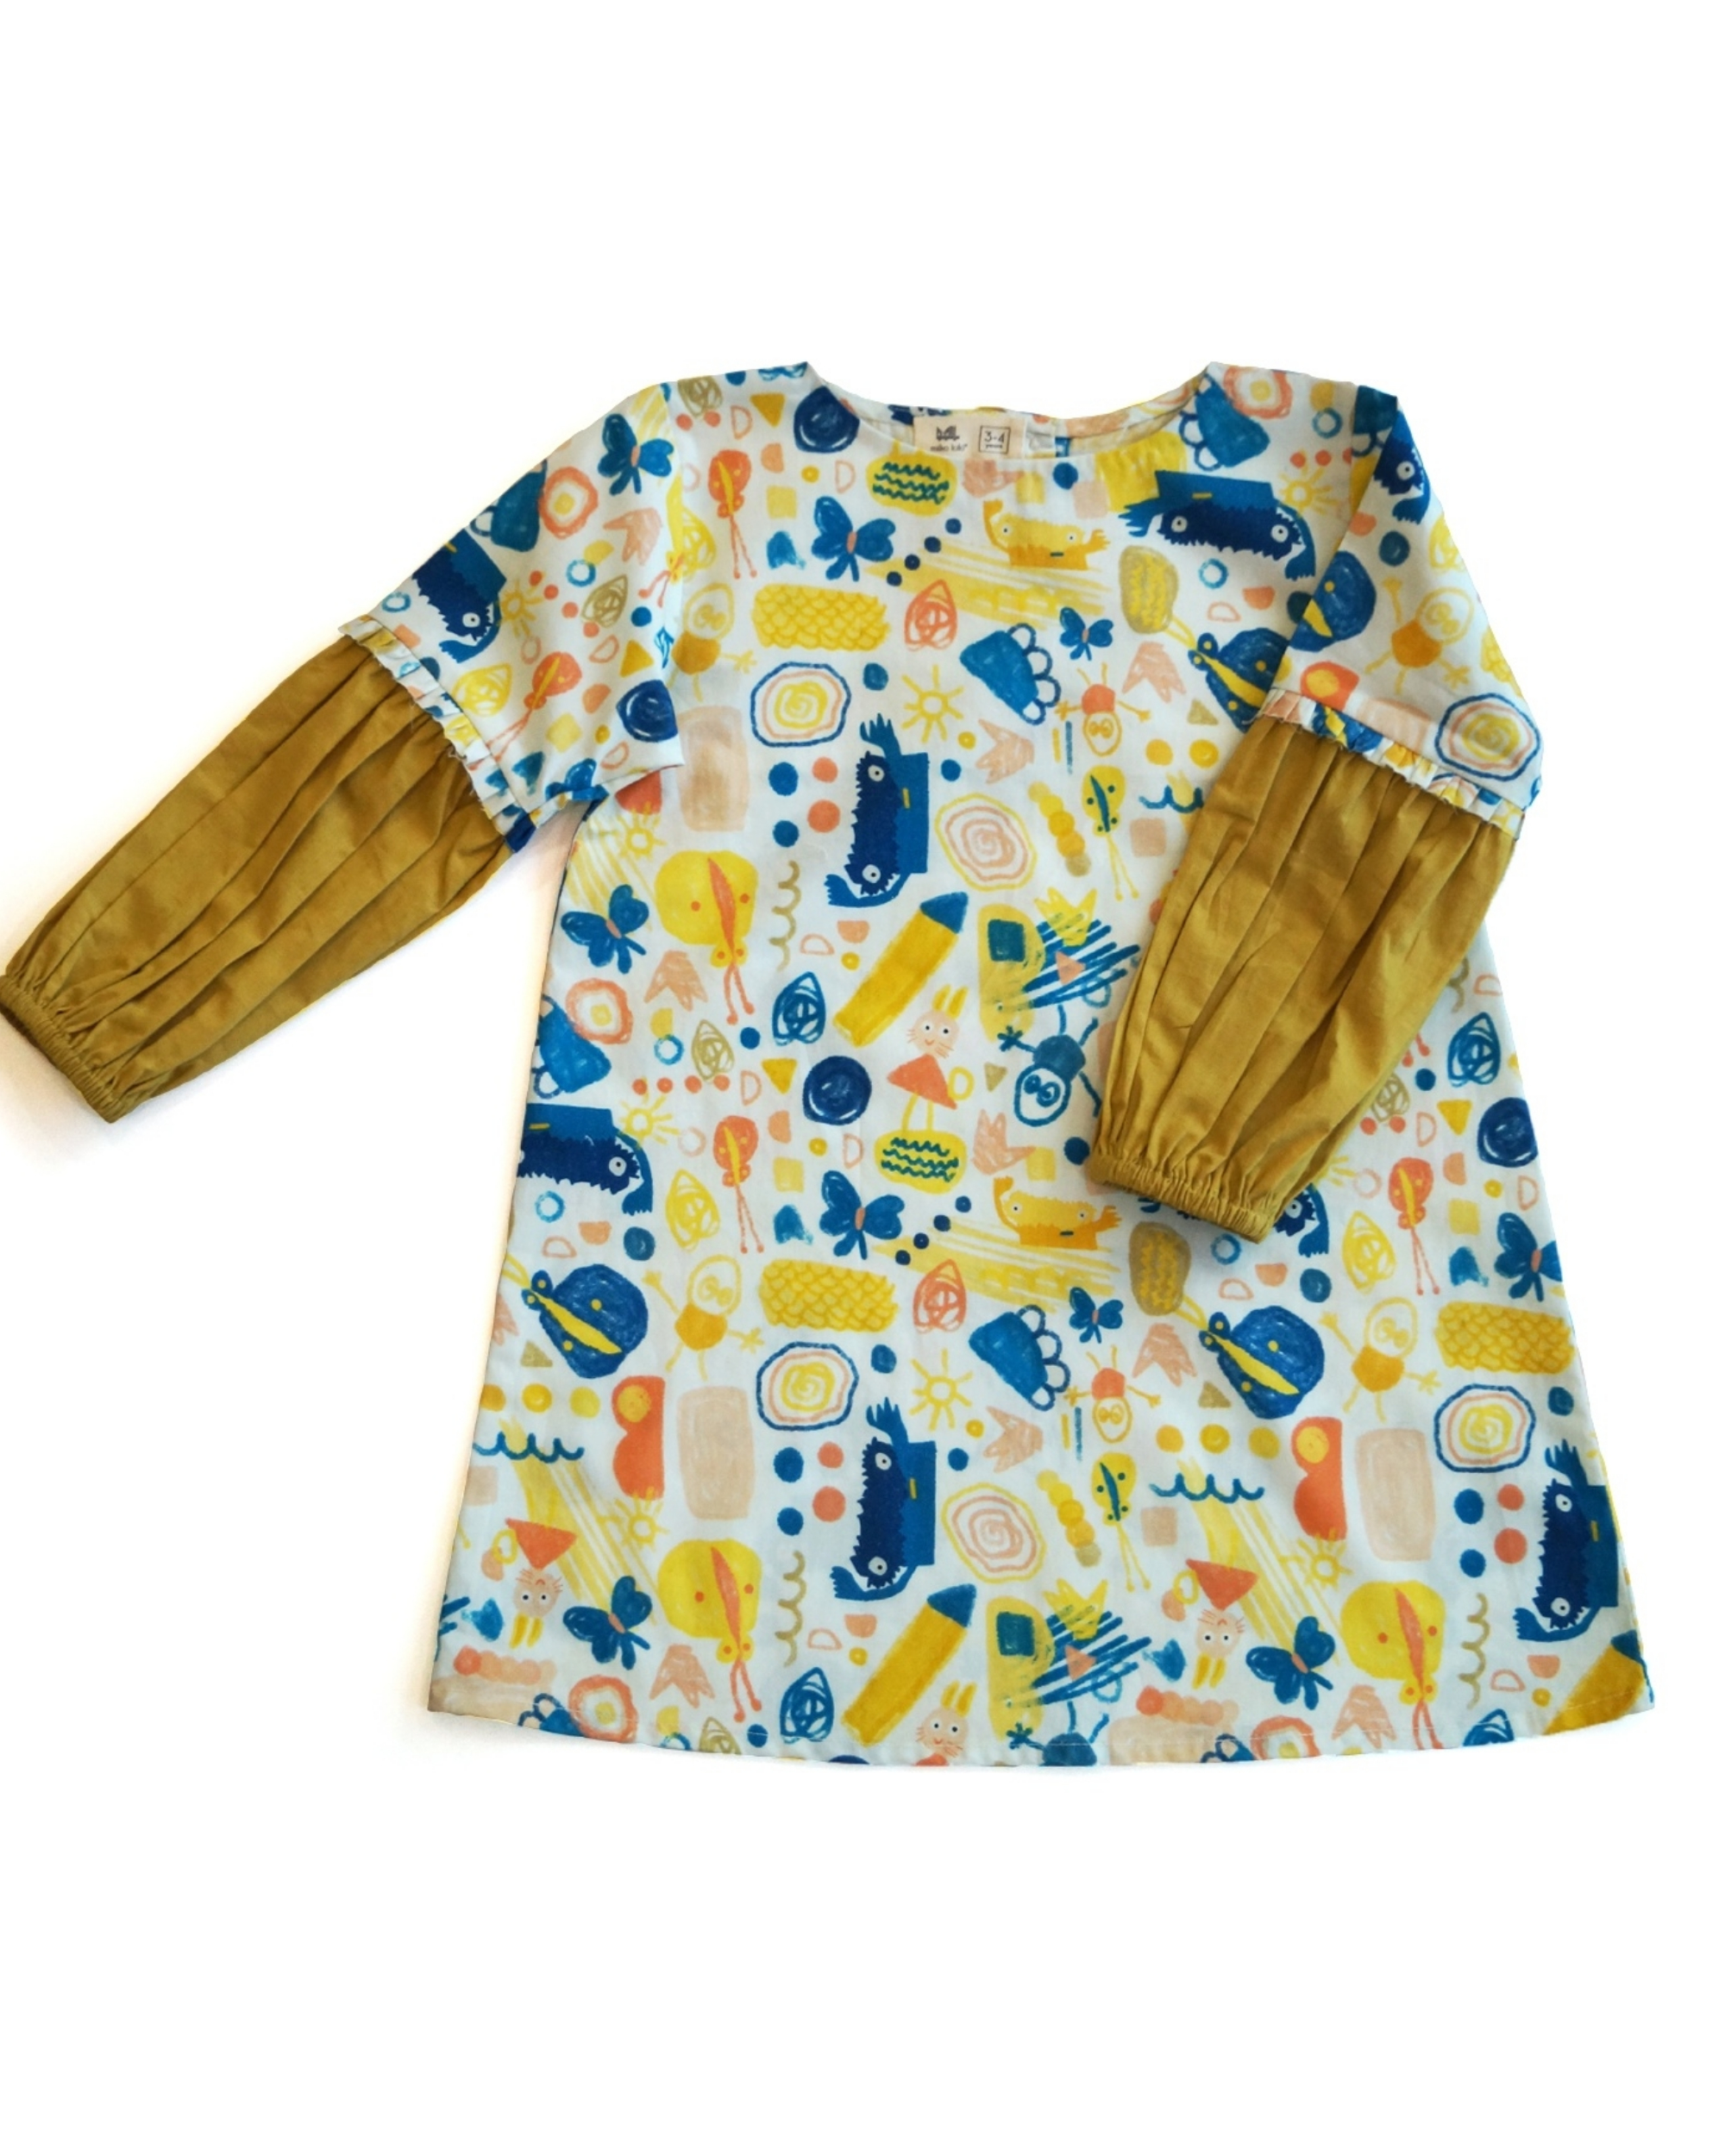 Scridoodle printed dress